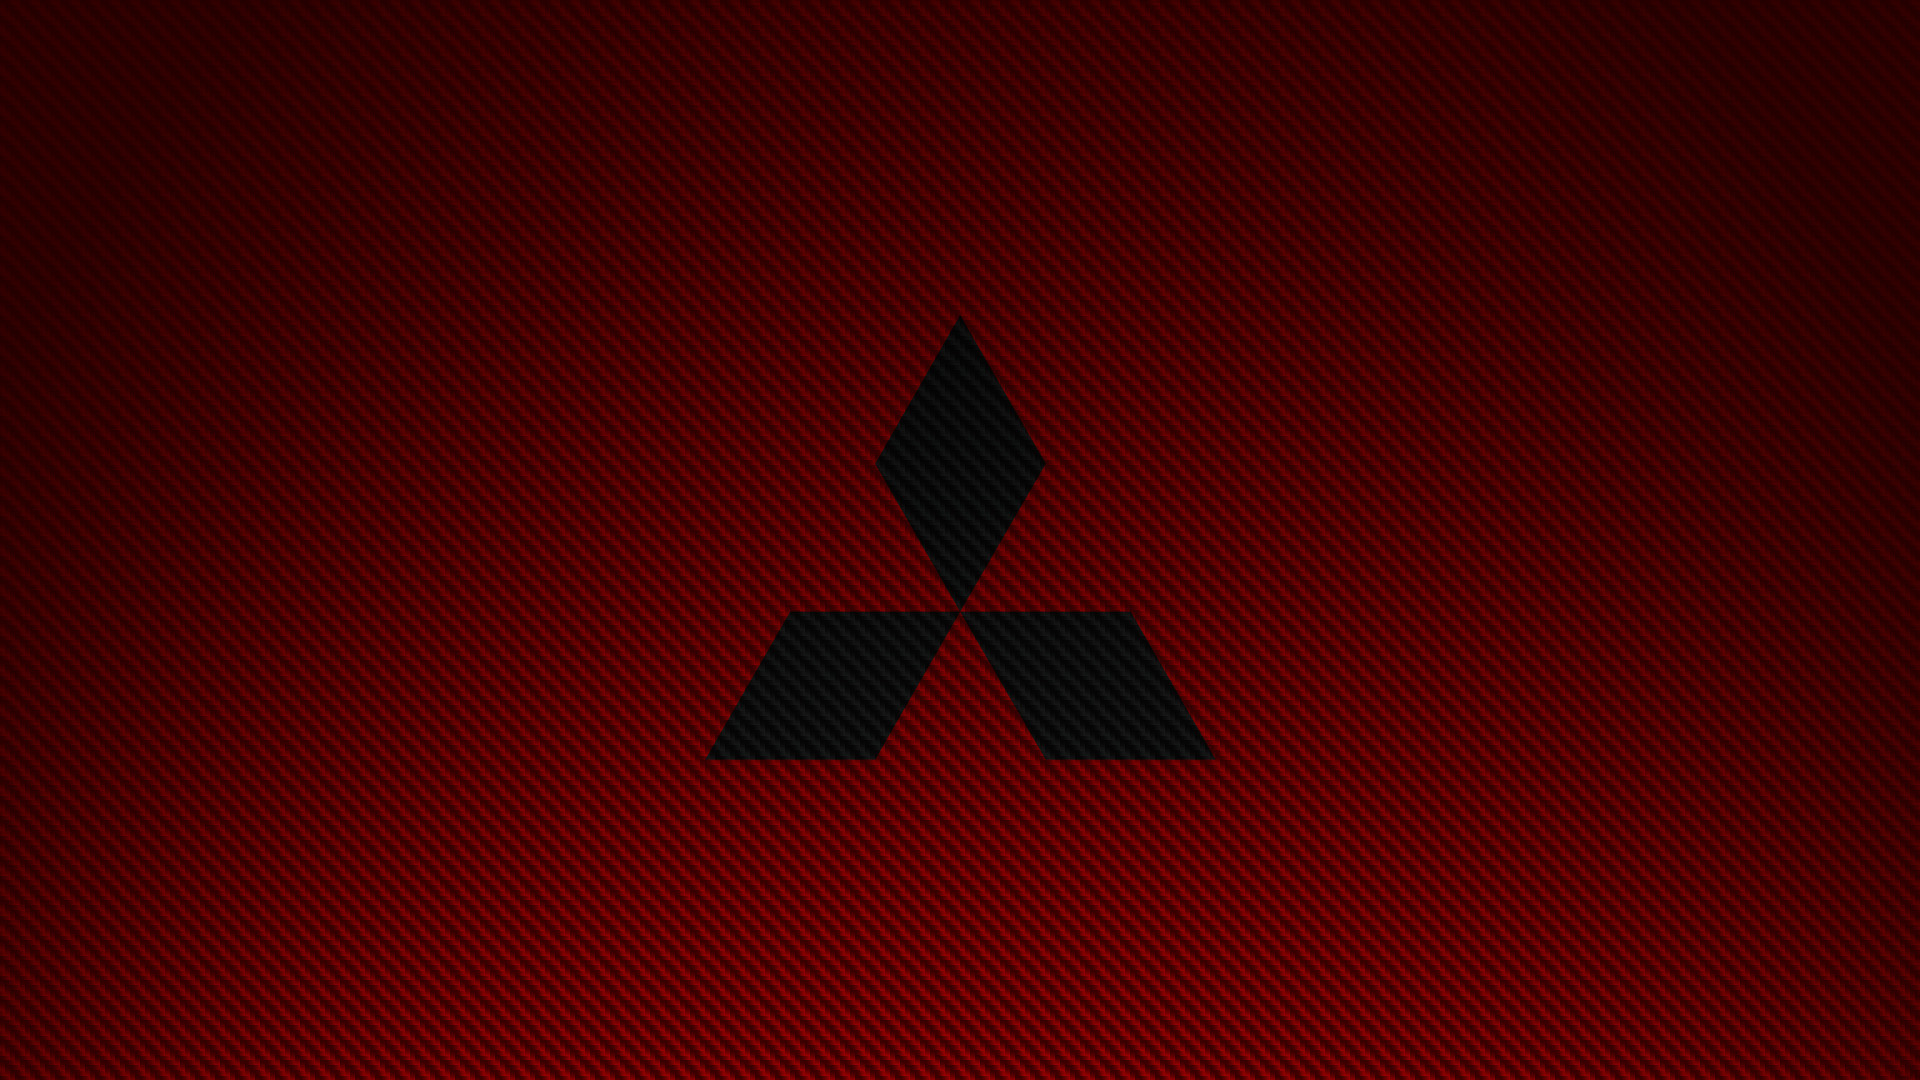 mitsubishi logo wallpapers 183��